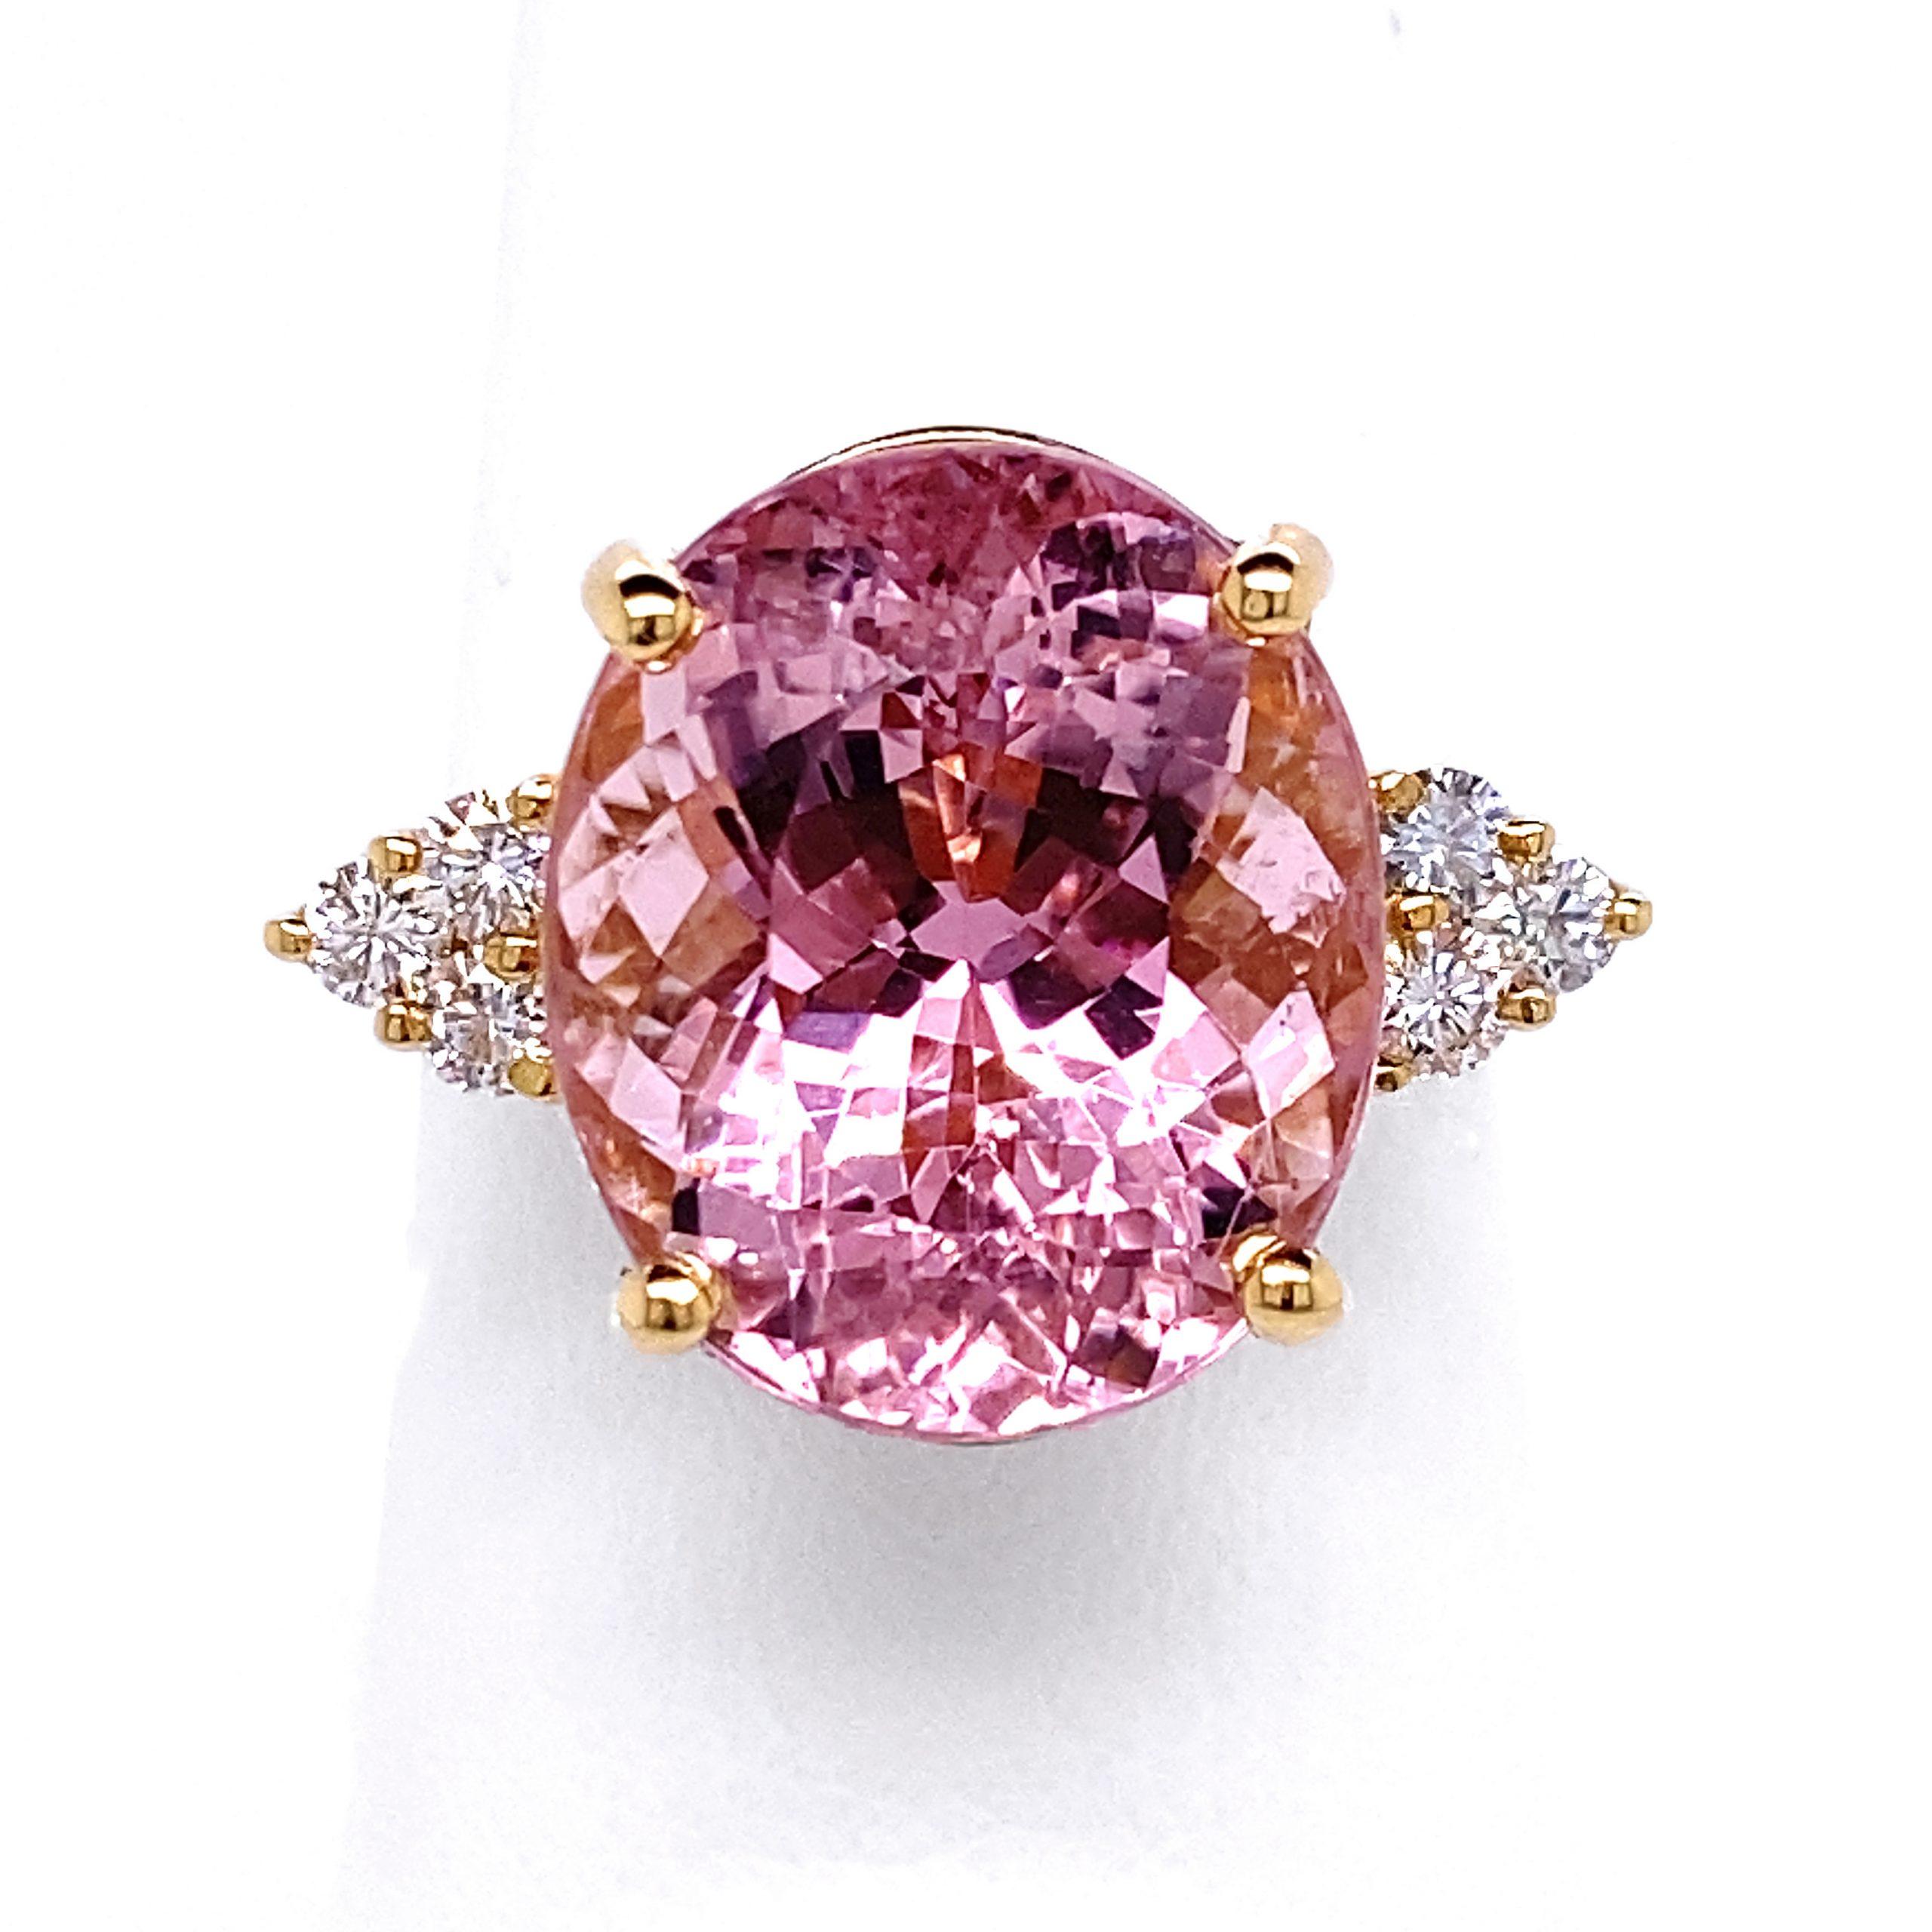 Richard Krementz Collection Pink Tourmaline Ring